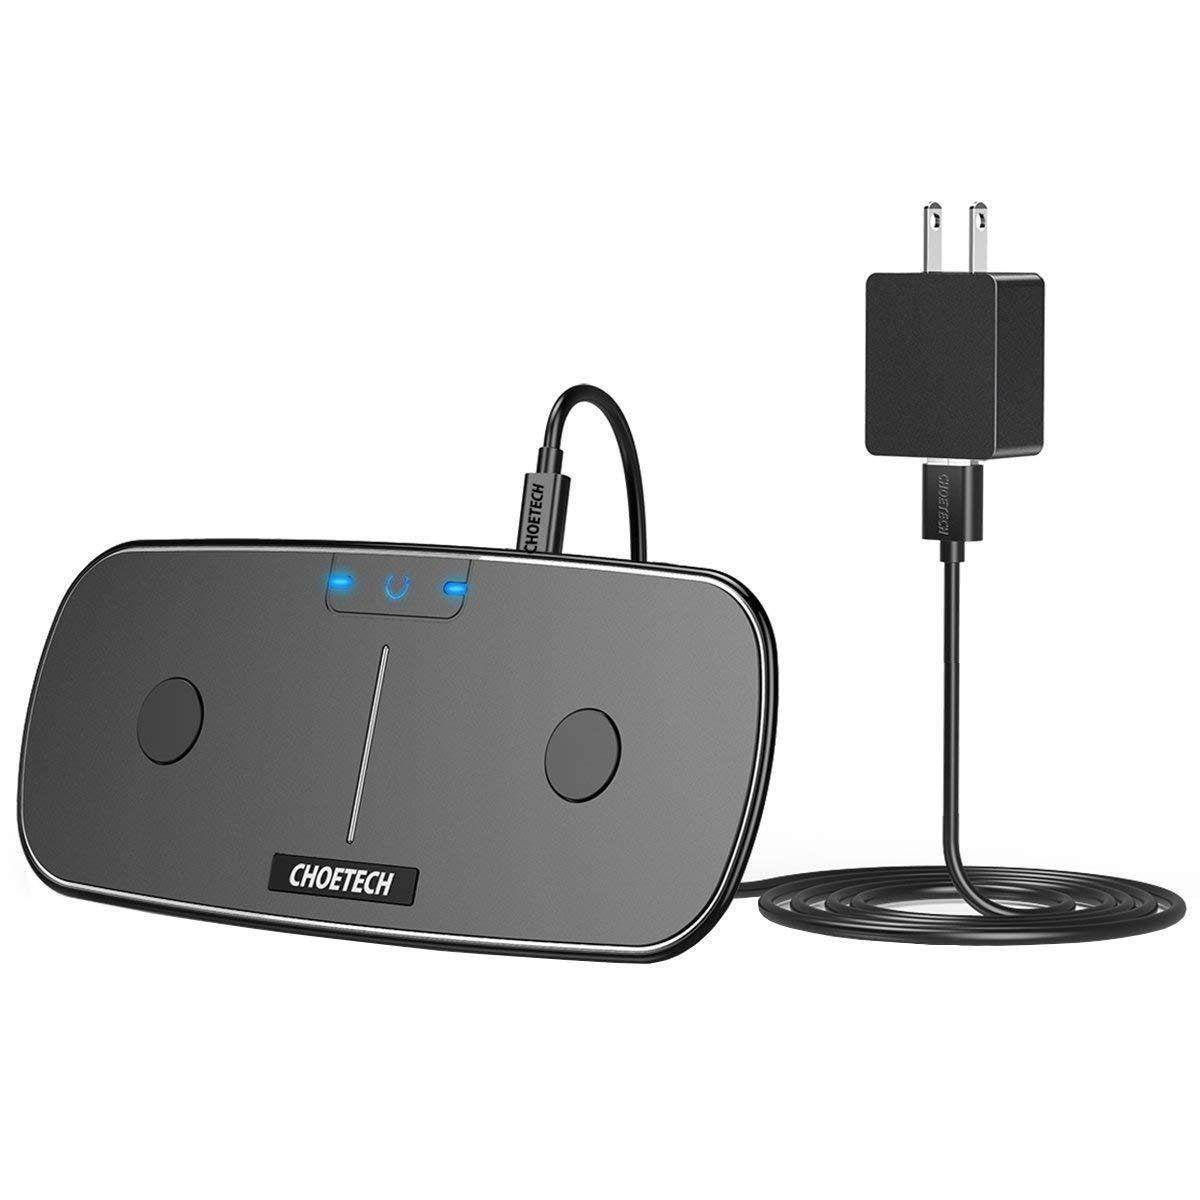 CHOETECH wireless charging pad